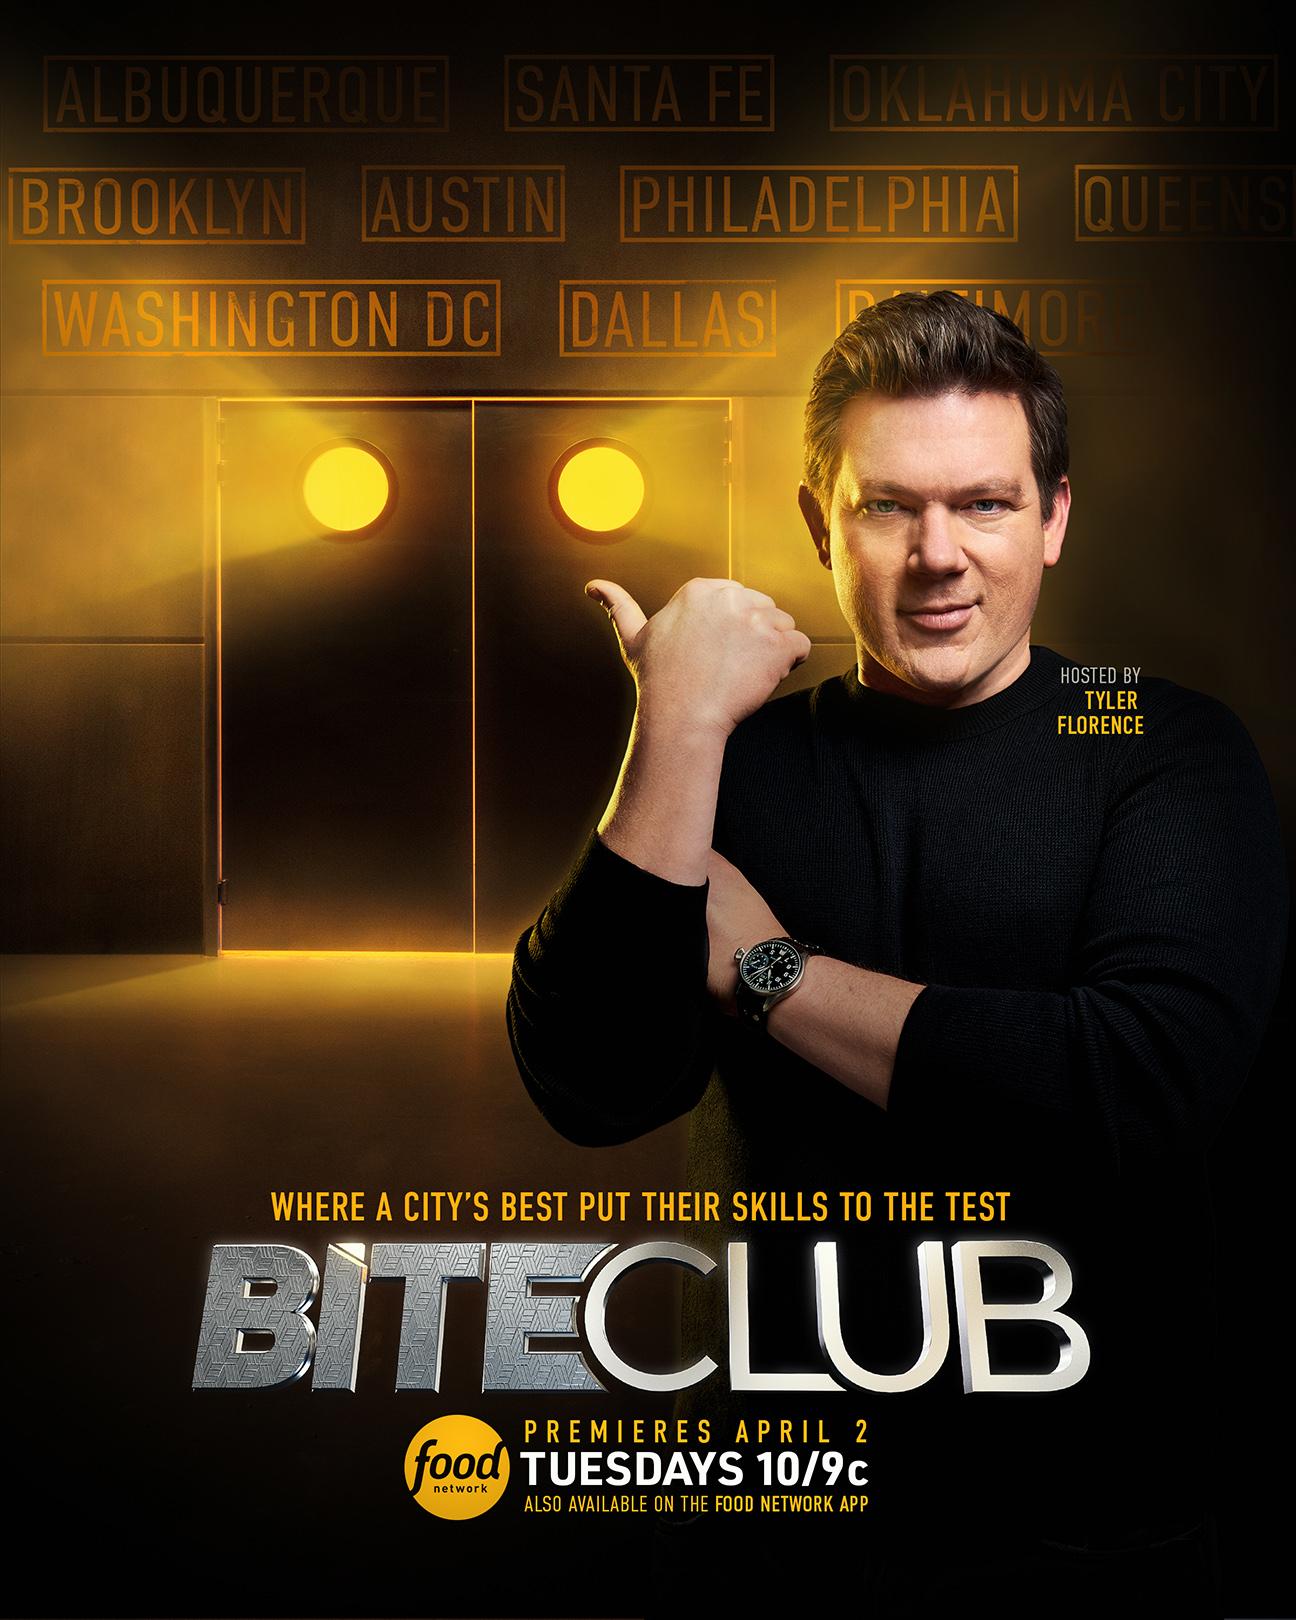 BiteClub_KeyArt.jpg